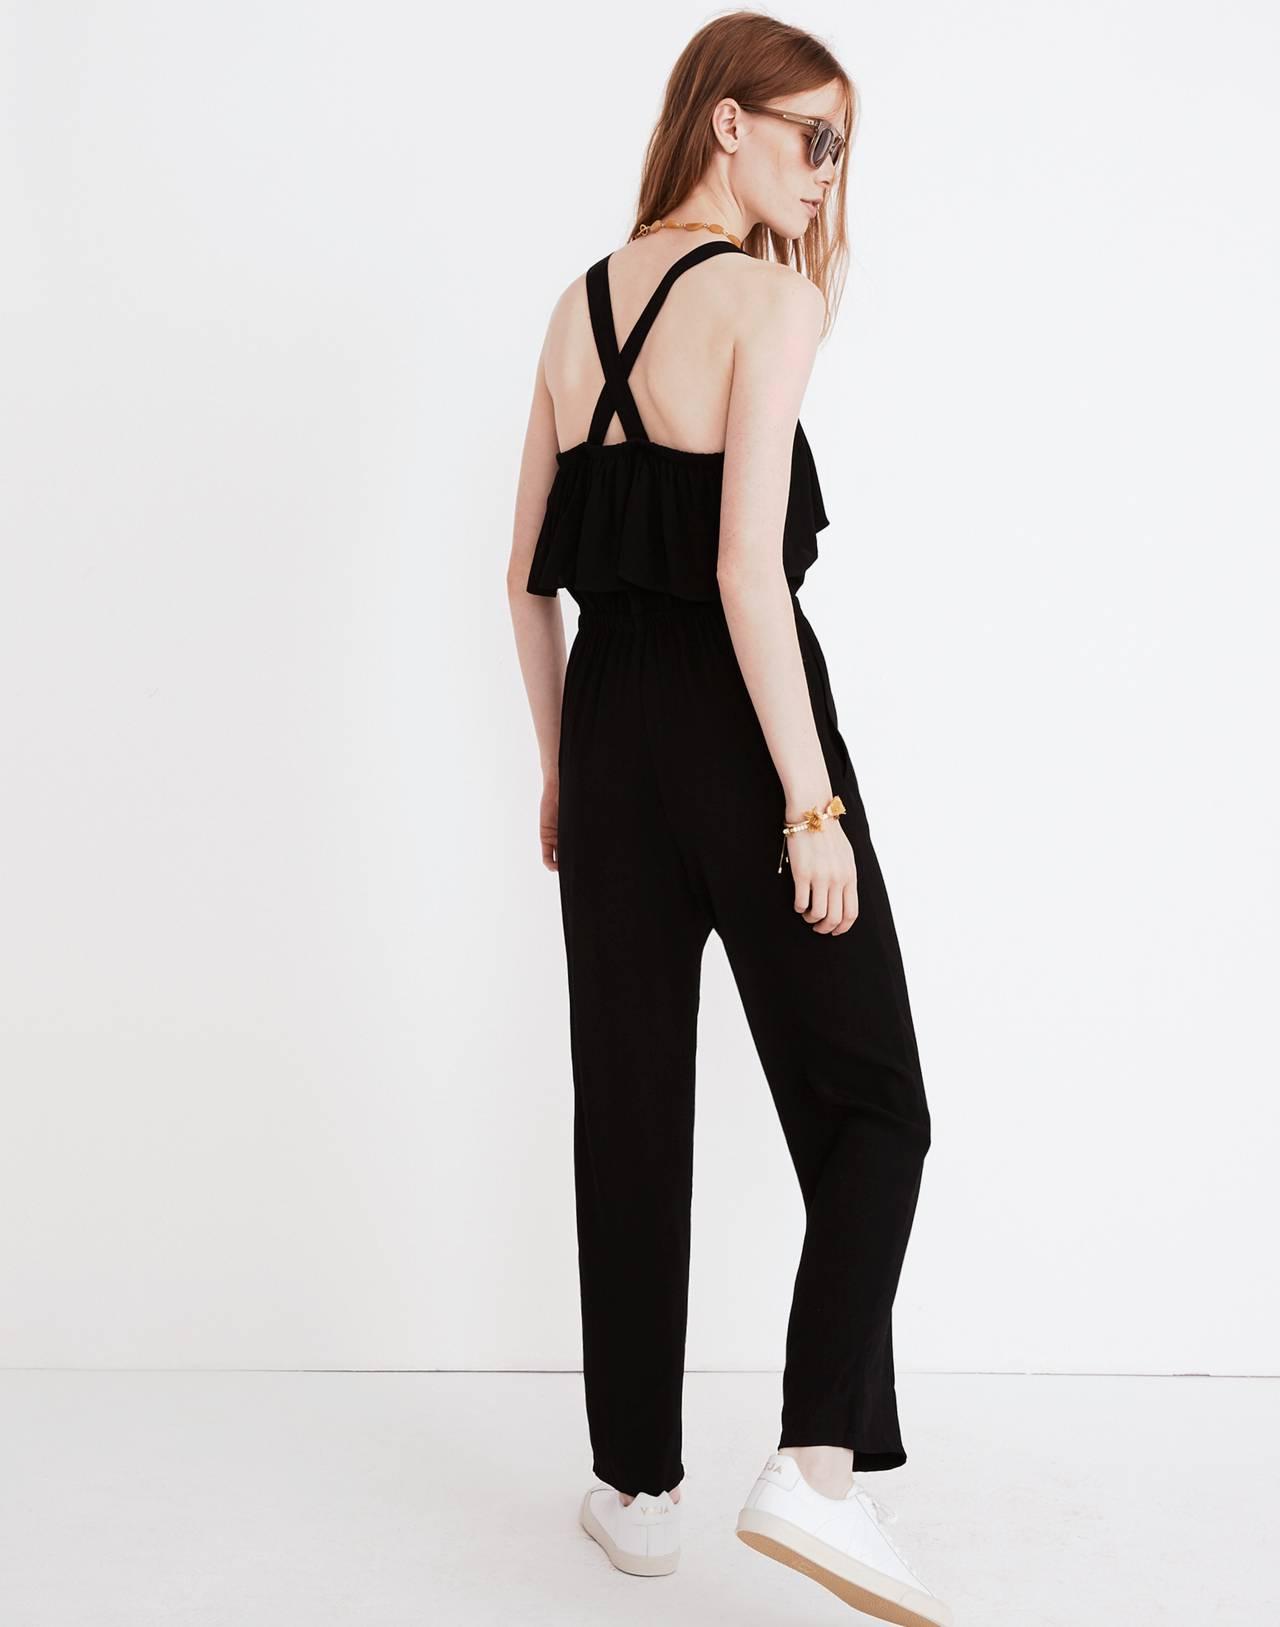 Apron Ruffle Jumpsuit in true black image 2